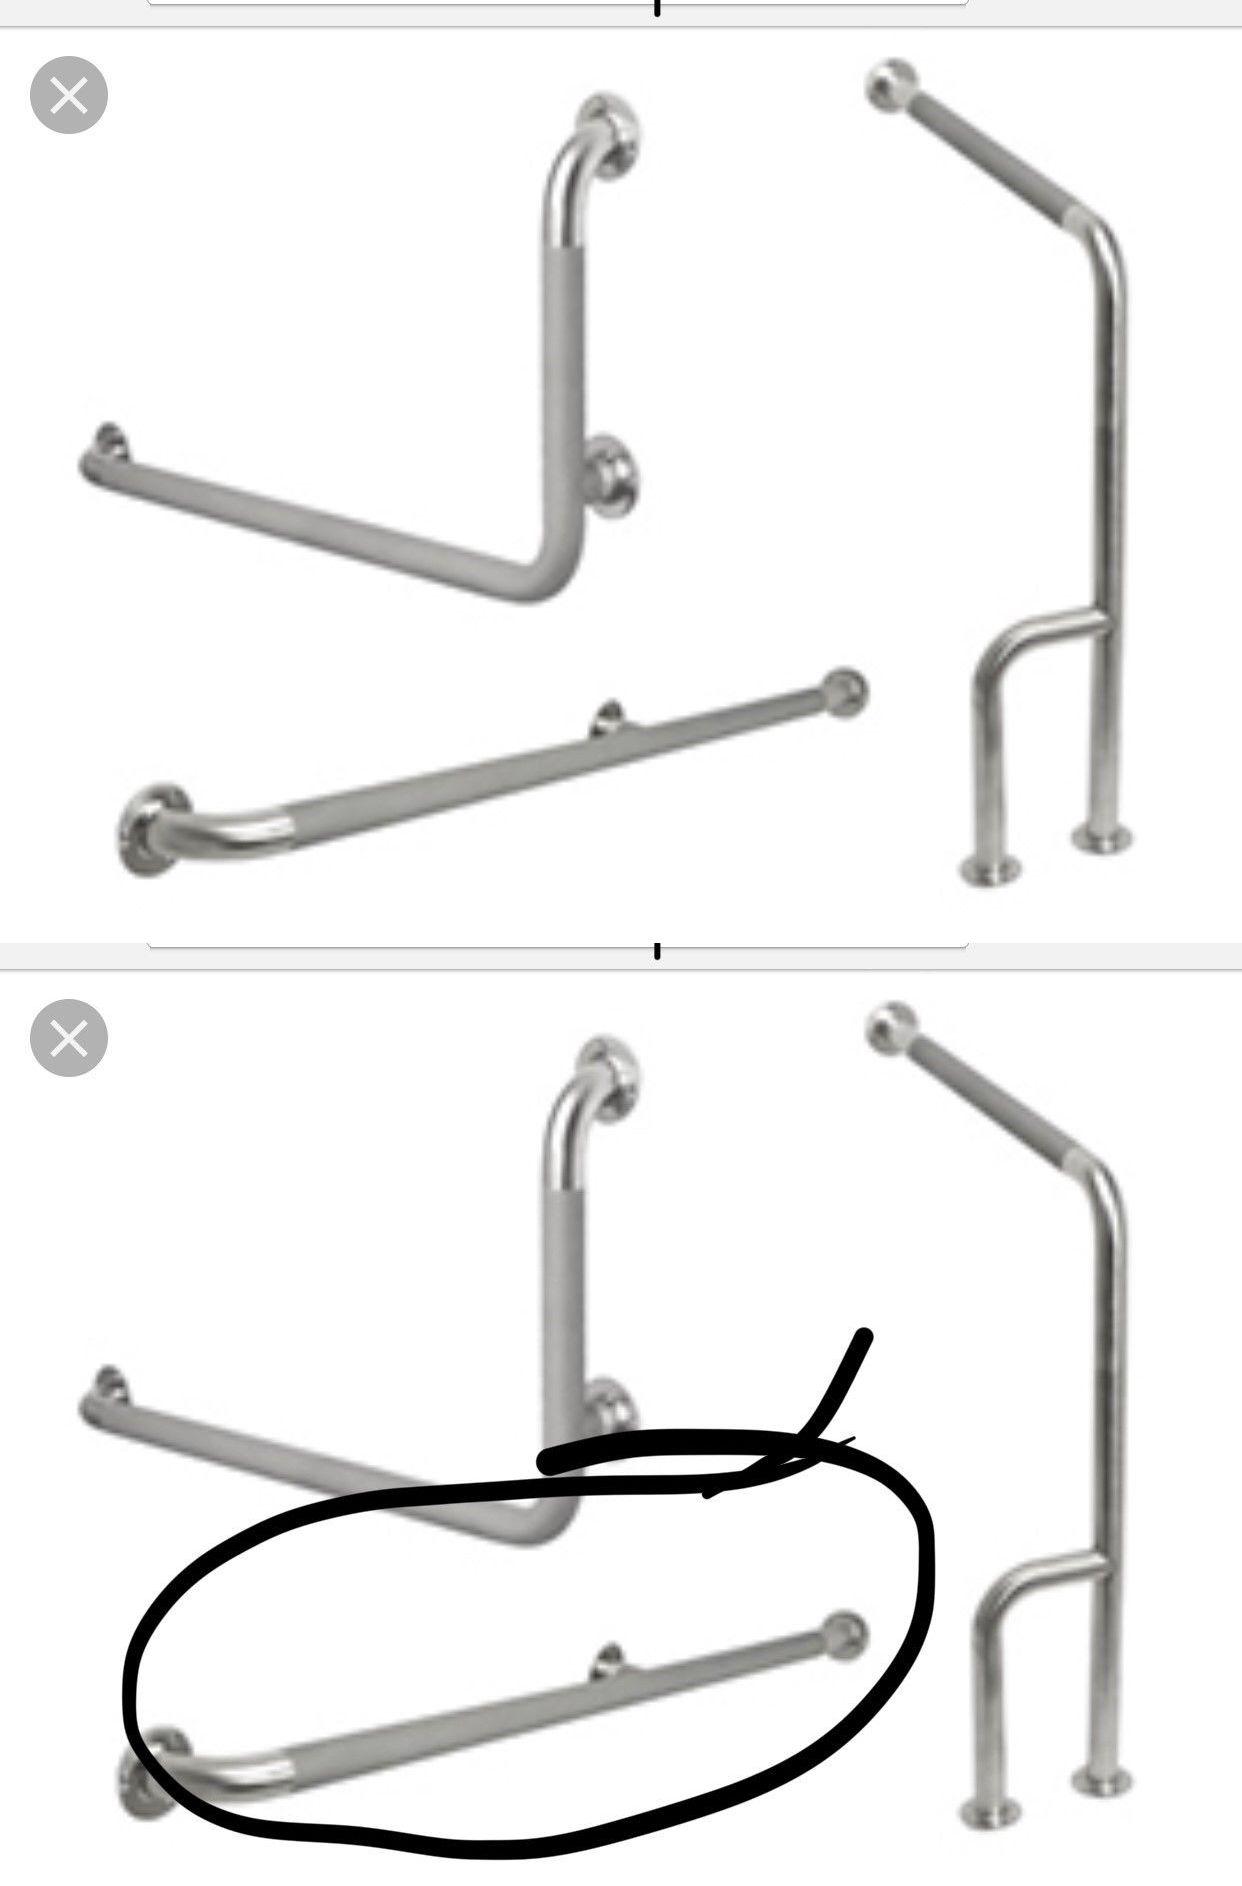 Handicap grab bar bathtub bathroom accessories shower safety inch